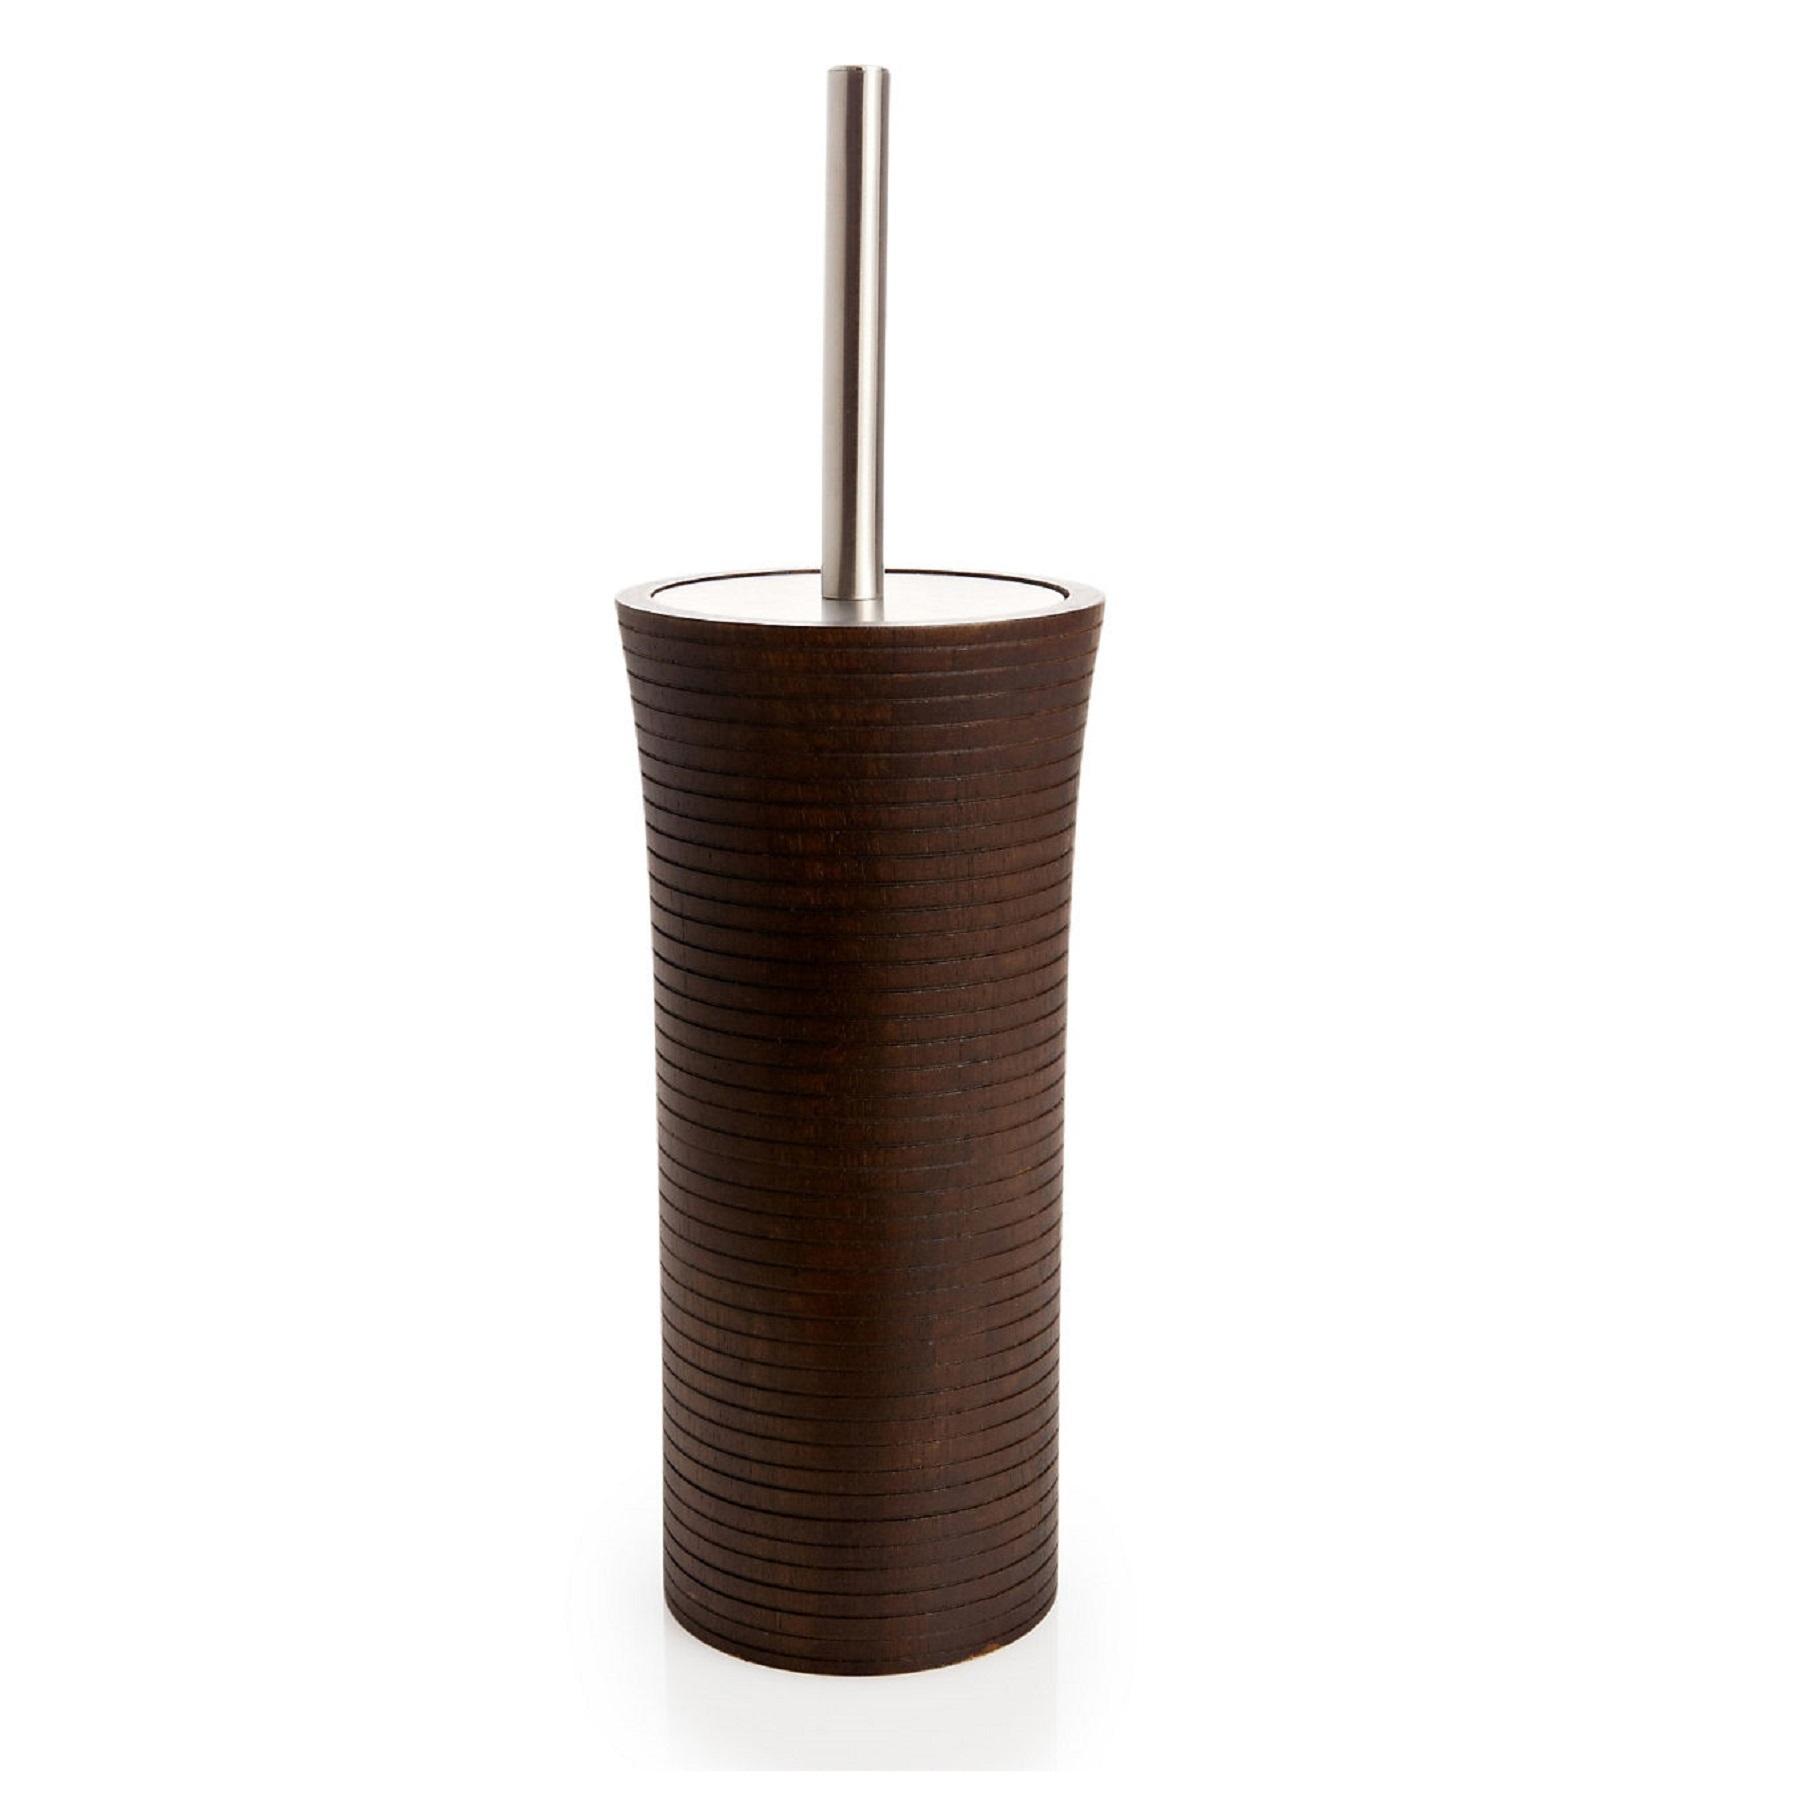 Ершики для туалета Ершик для туалета Kassatex Rubber Wood Eko yorshik-dlya-tualeta-rubber-wood-eko-ot-kassatex-ssha-kitay-ssha-kitay.jpg